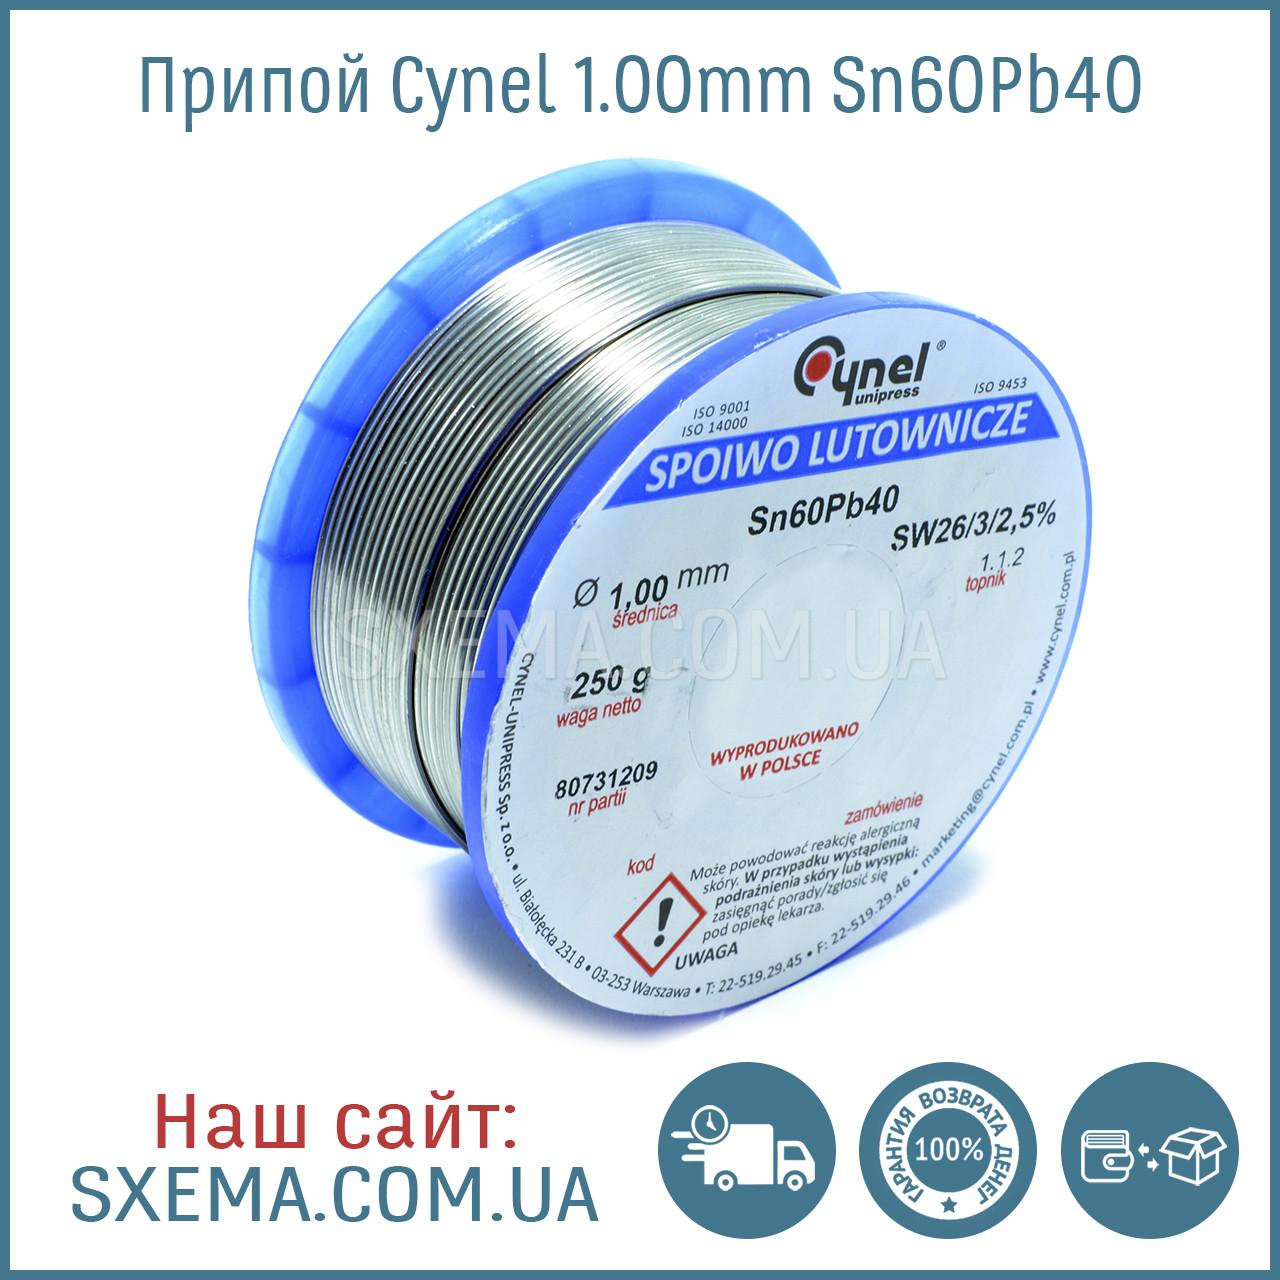 Припой для пайки оловянно-свинцовый Cynel SW26/3/2.5 250гр 1мм